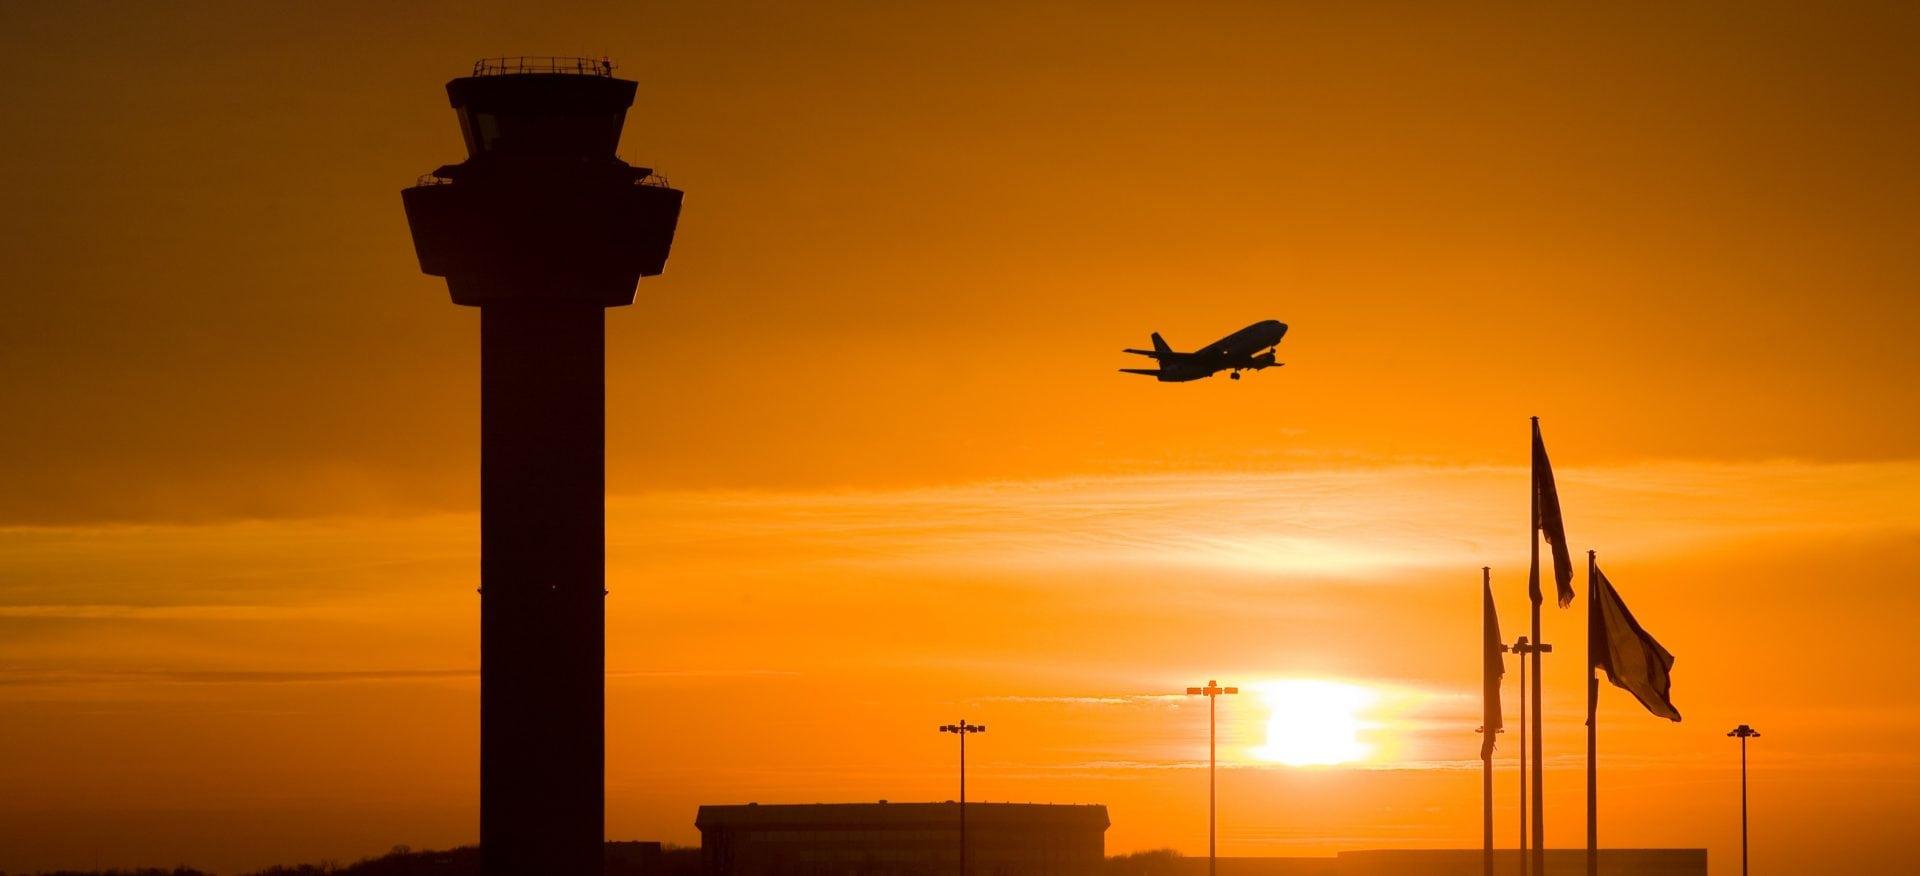 Aeropuerto de Heathrow resumen 2016